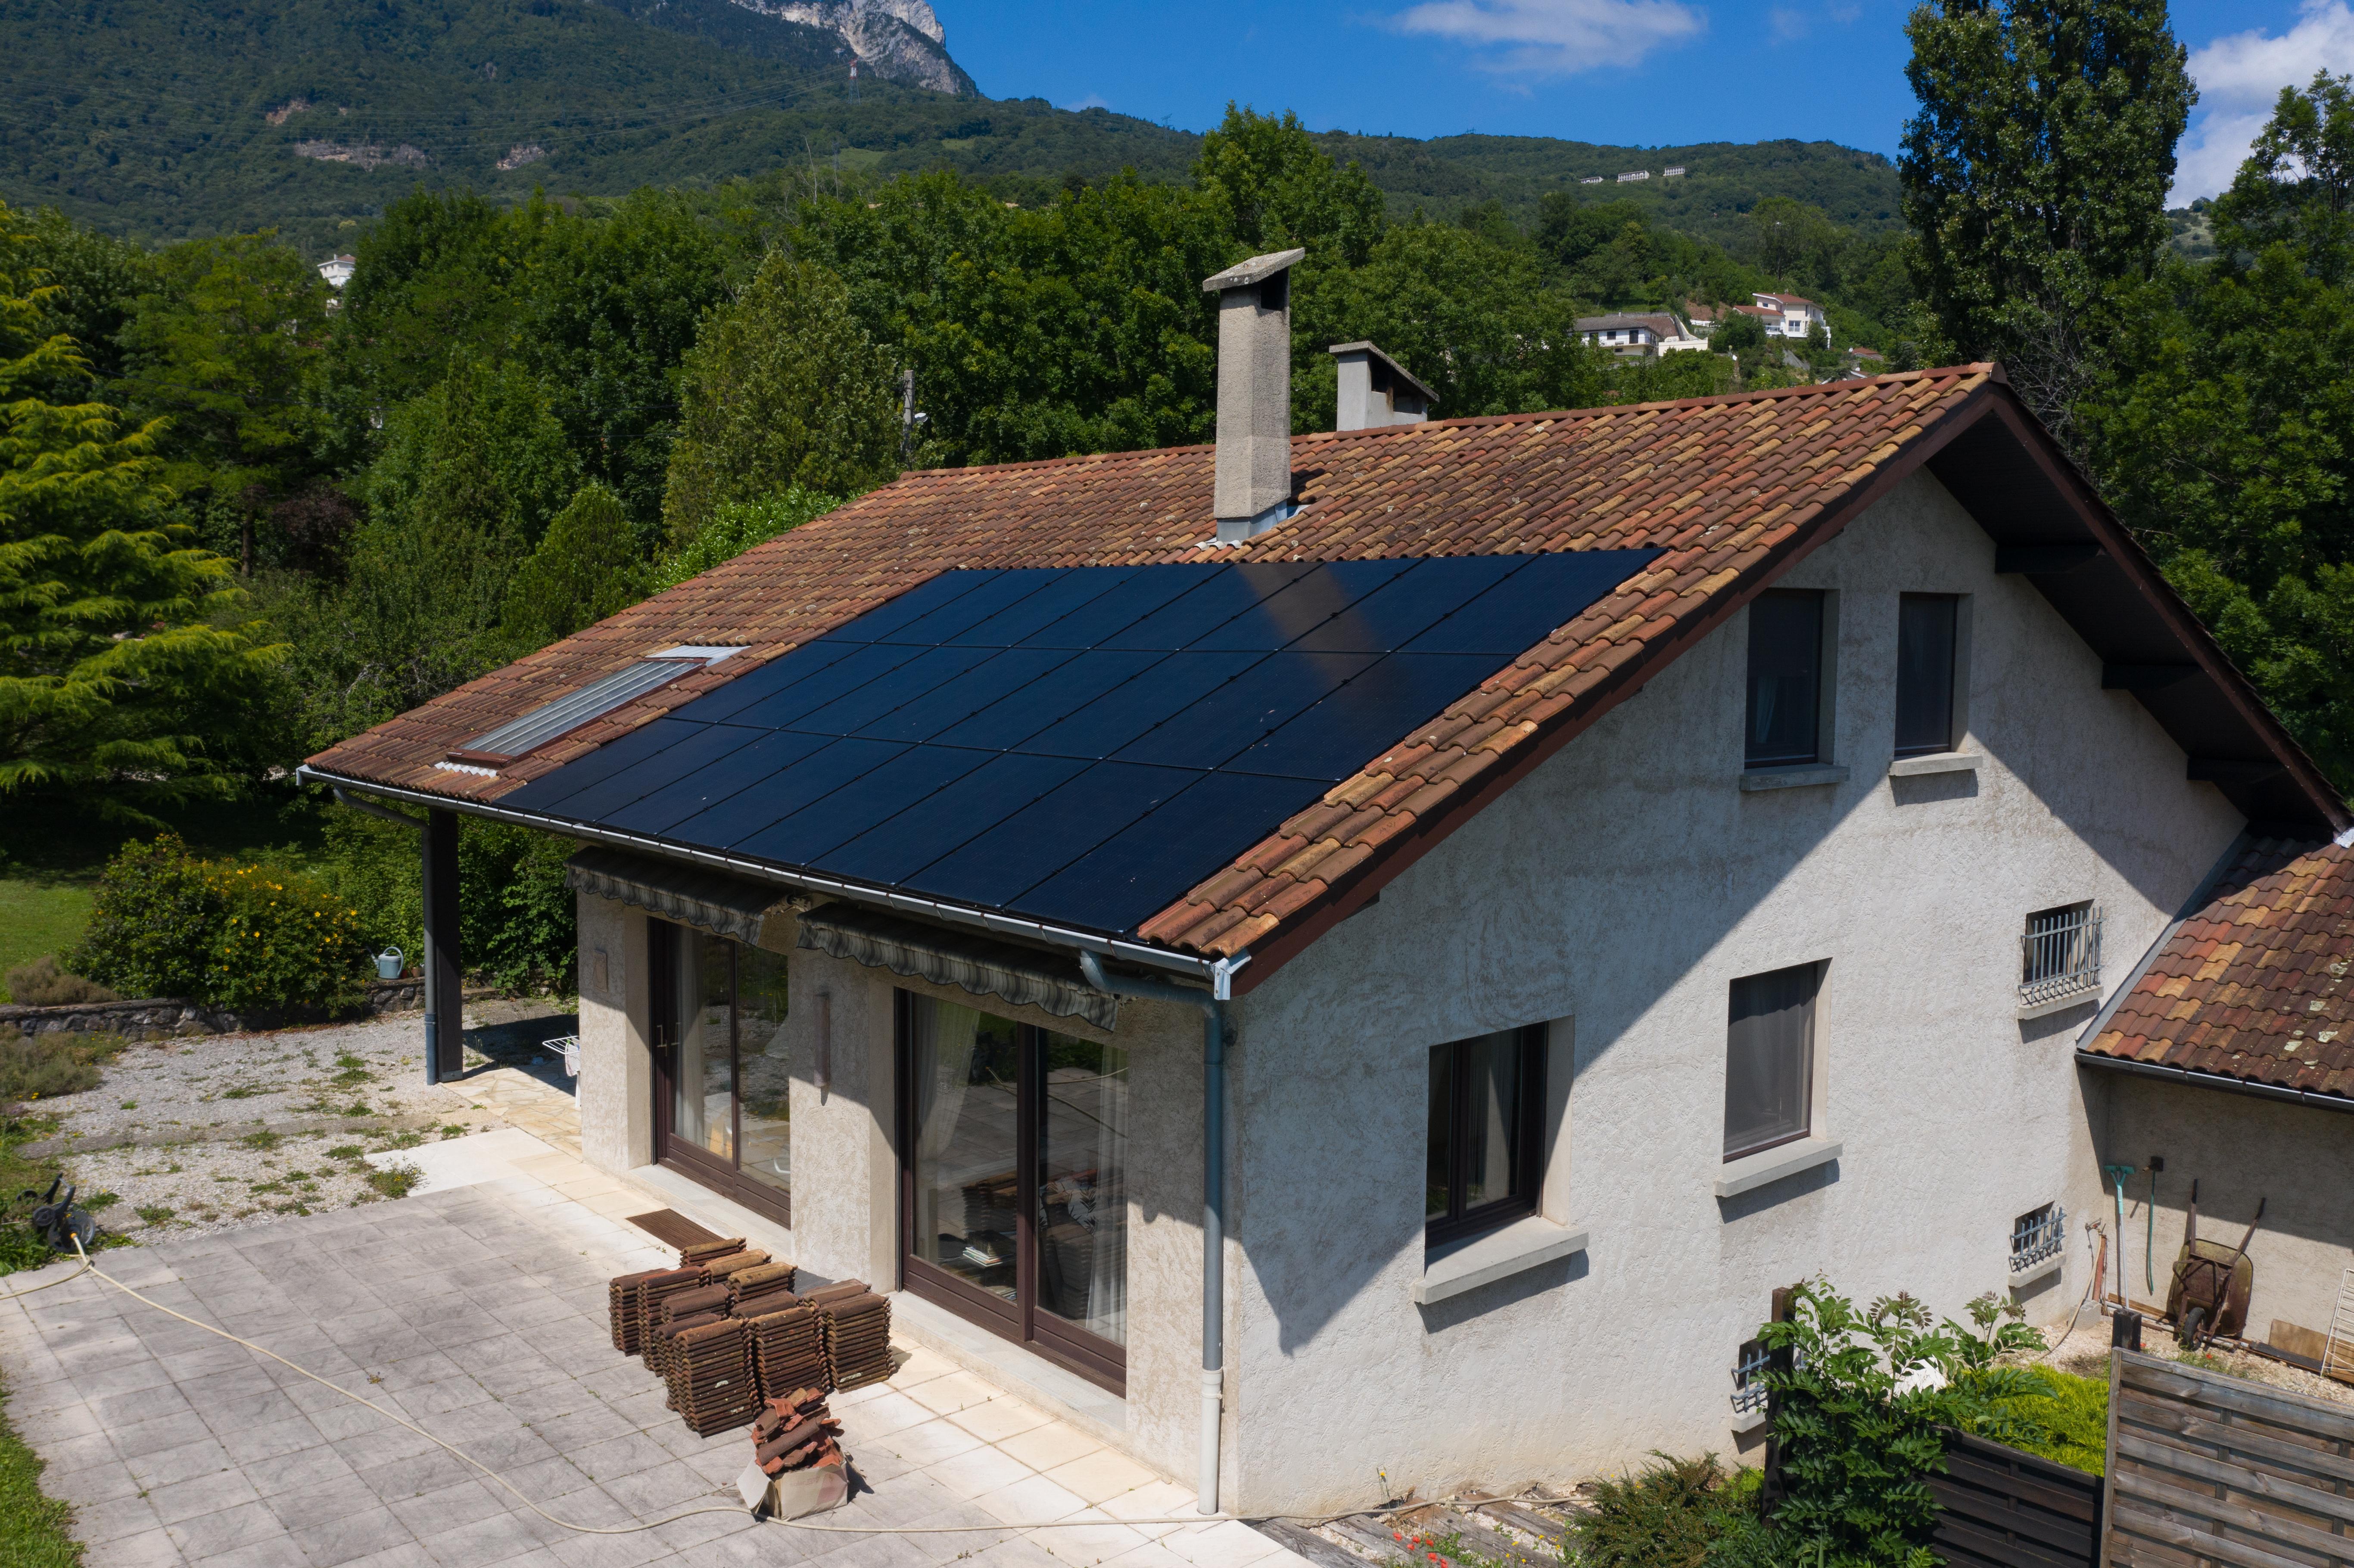 Installation solaire | EnergyGo